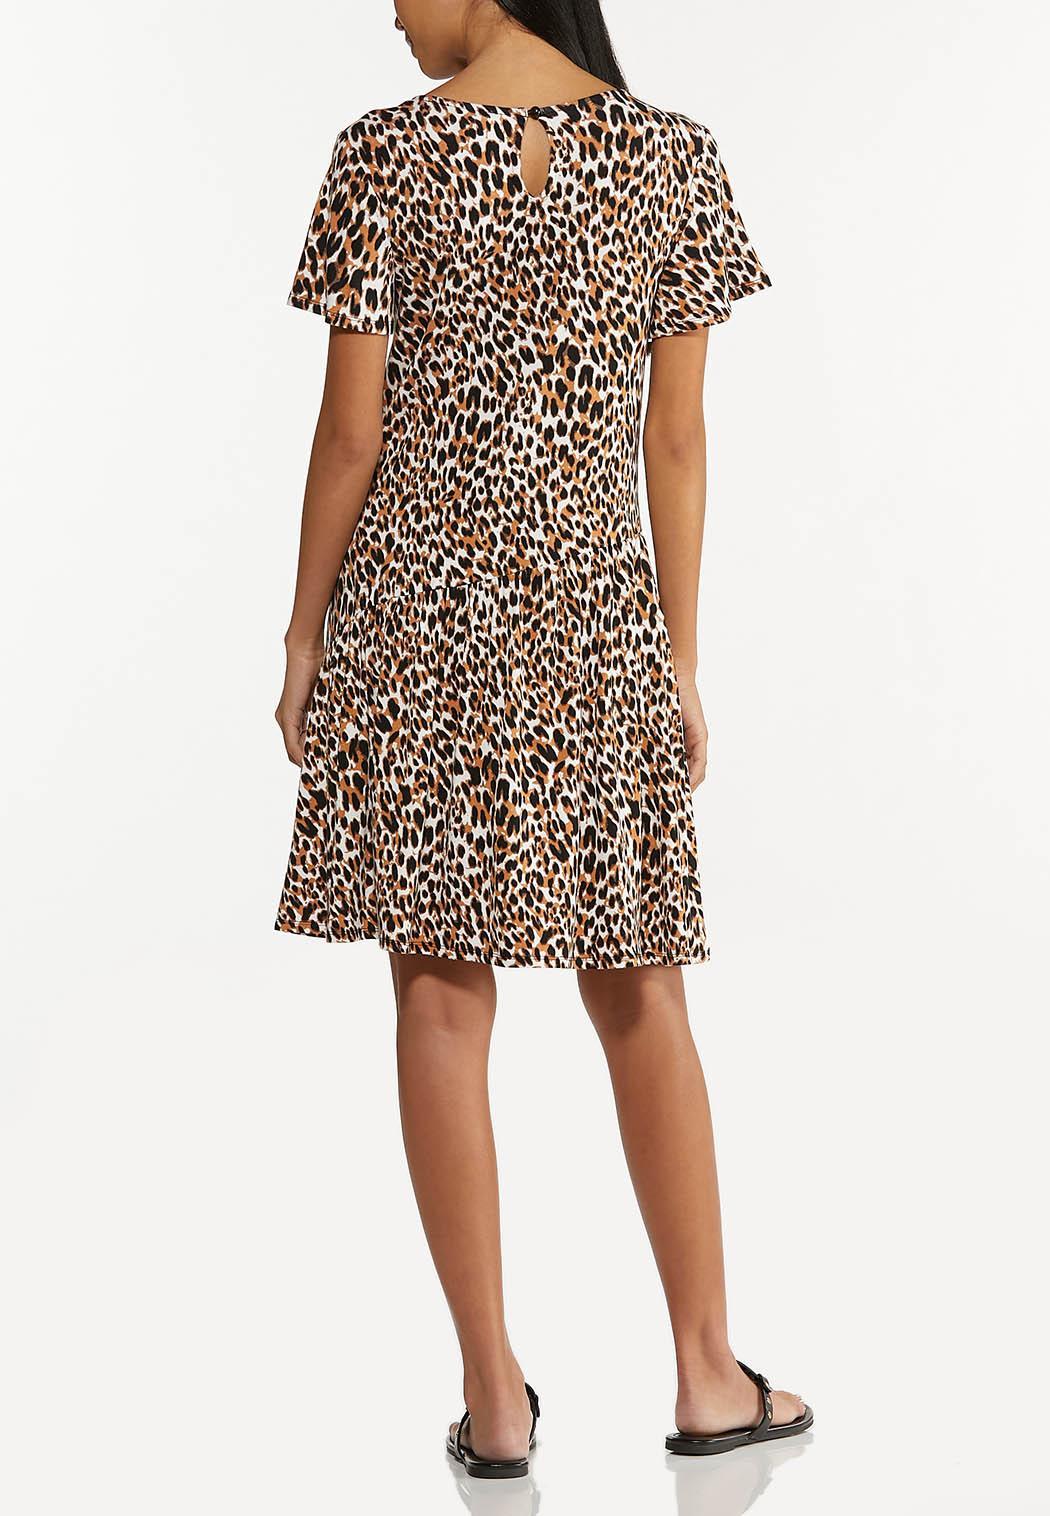 Leopard Babydoll Dress (Item #44619425)